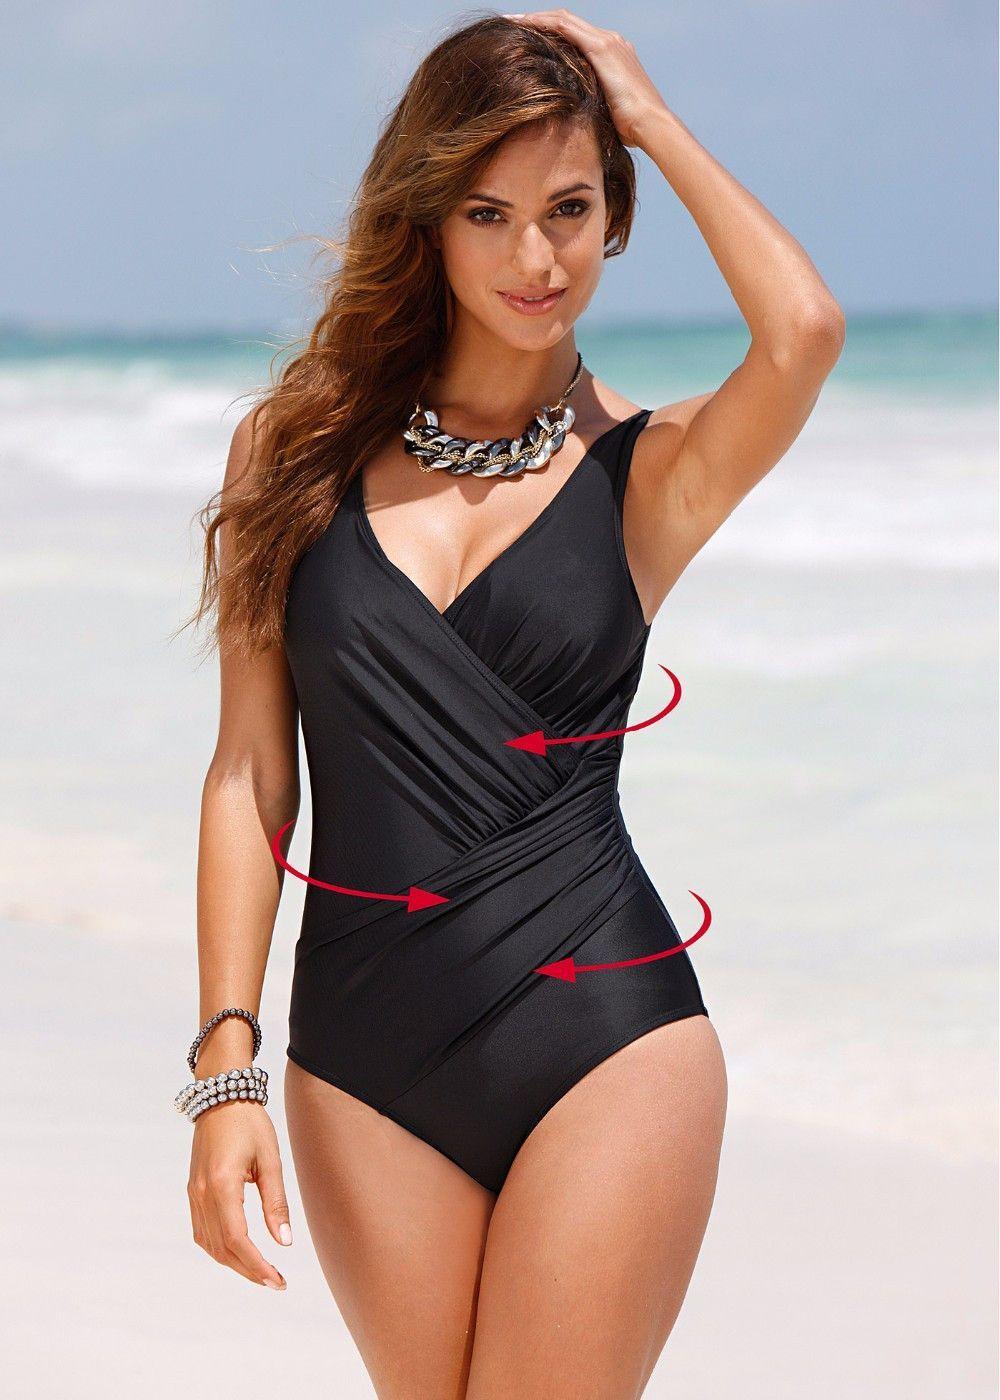 e47012f064 Top Quality Slimming Criss-Cross Draped Design Retro Vintage Style  Figure-Flattering One-Piece Bathing Suit 5 Colors M-4XL